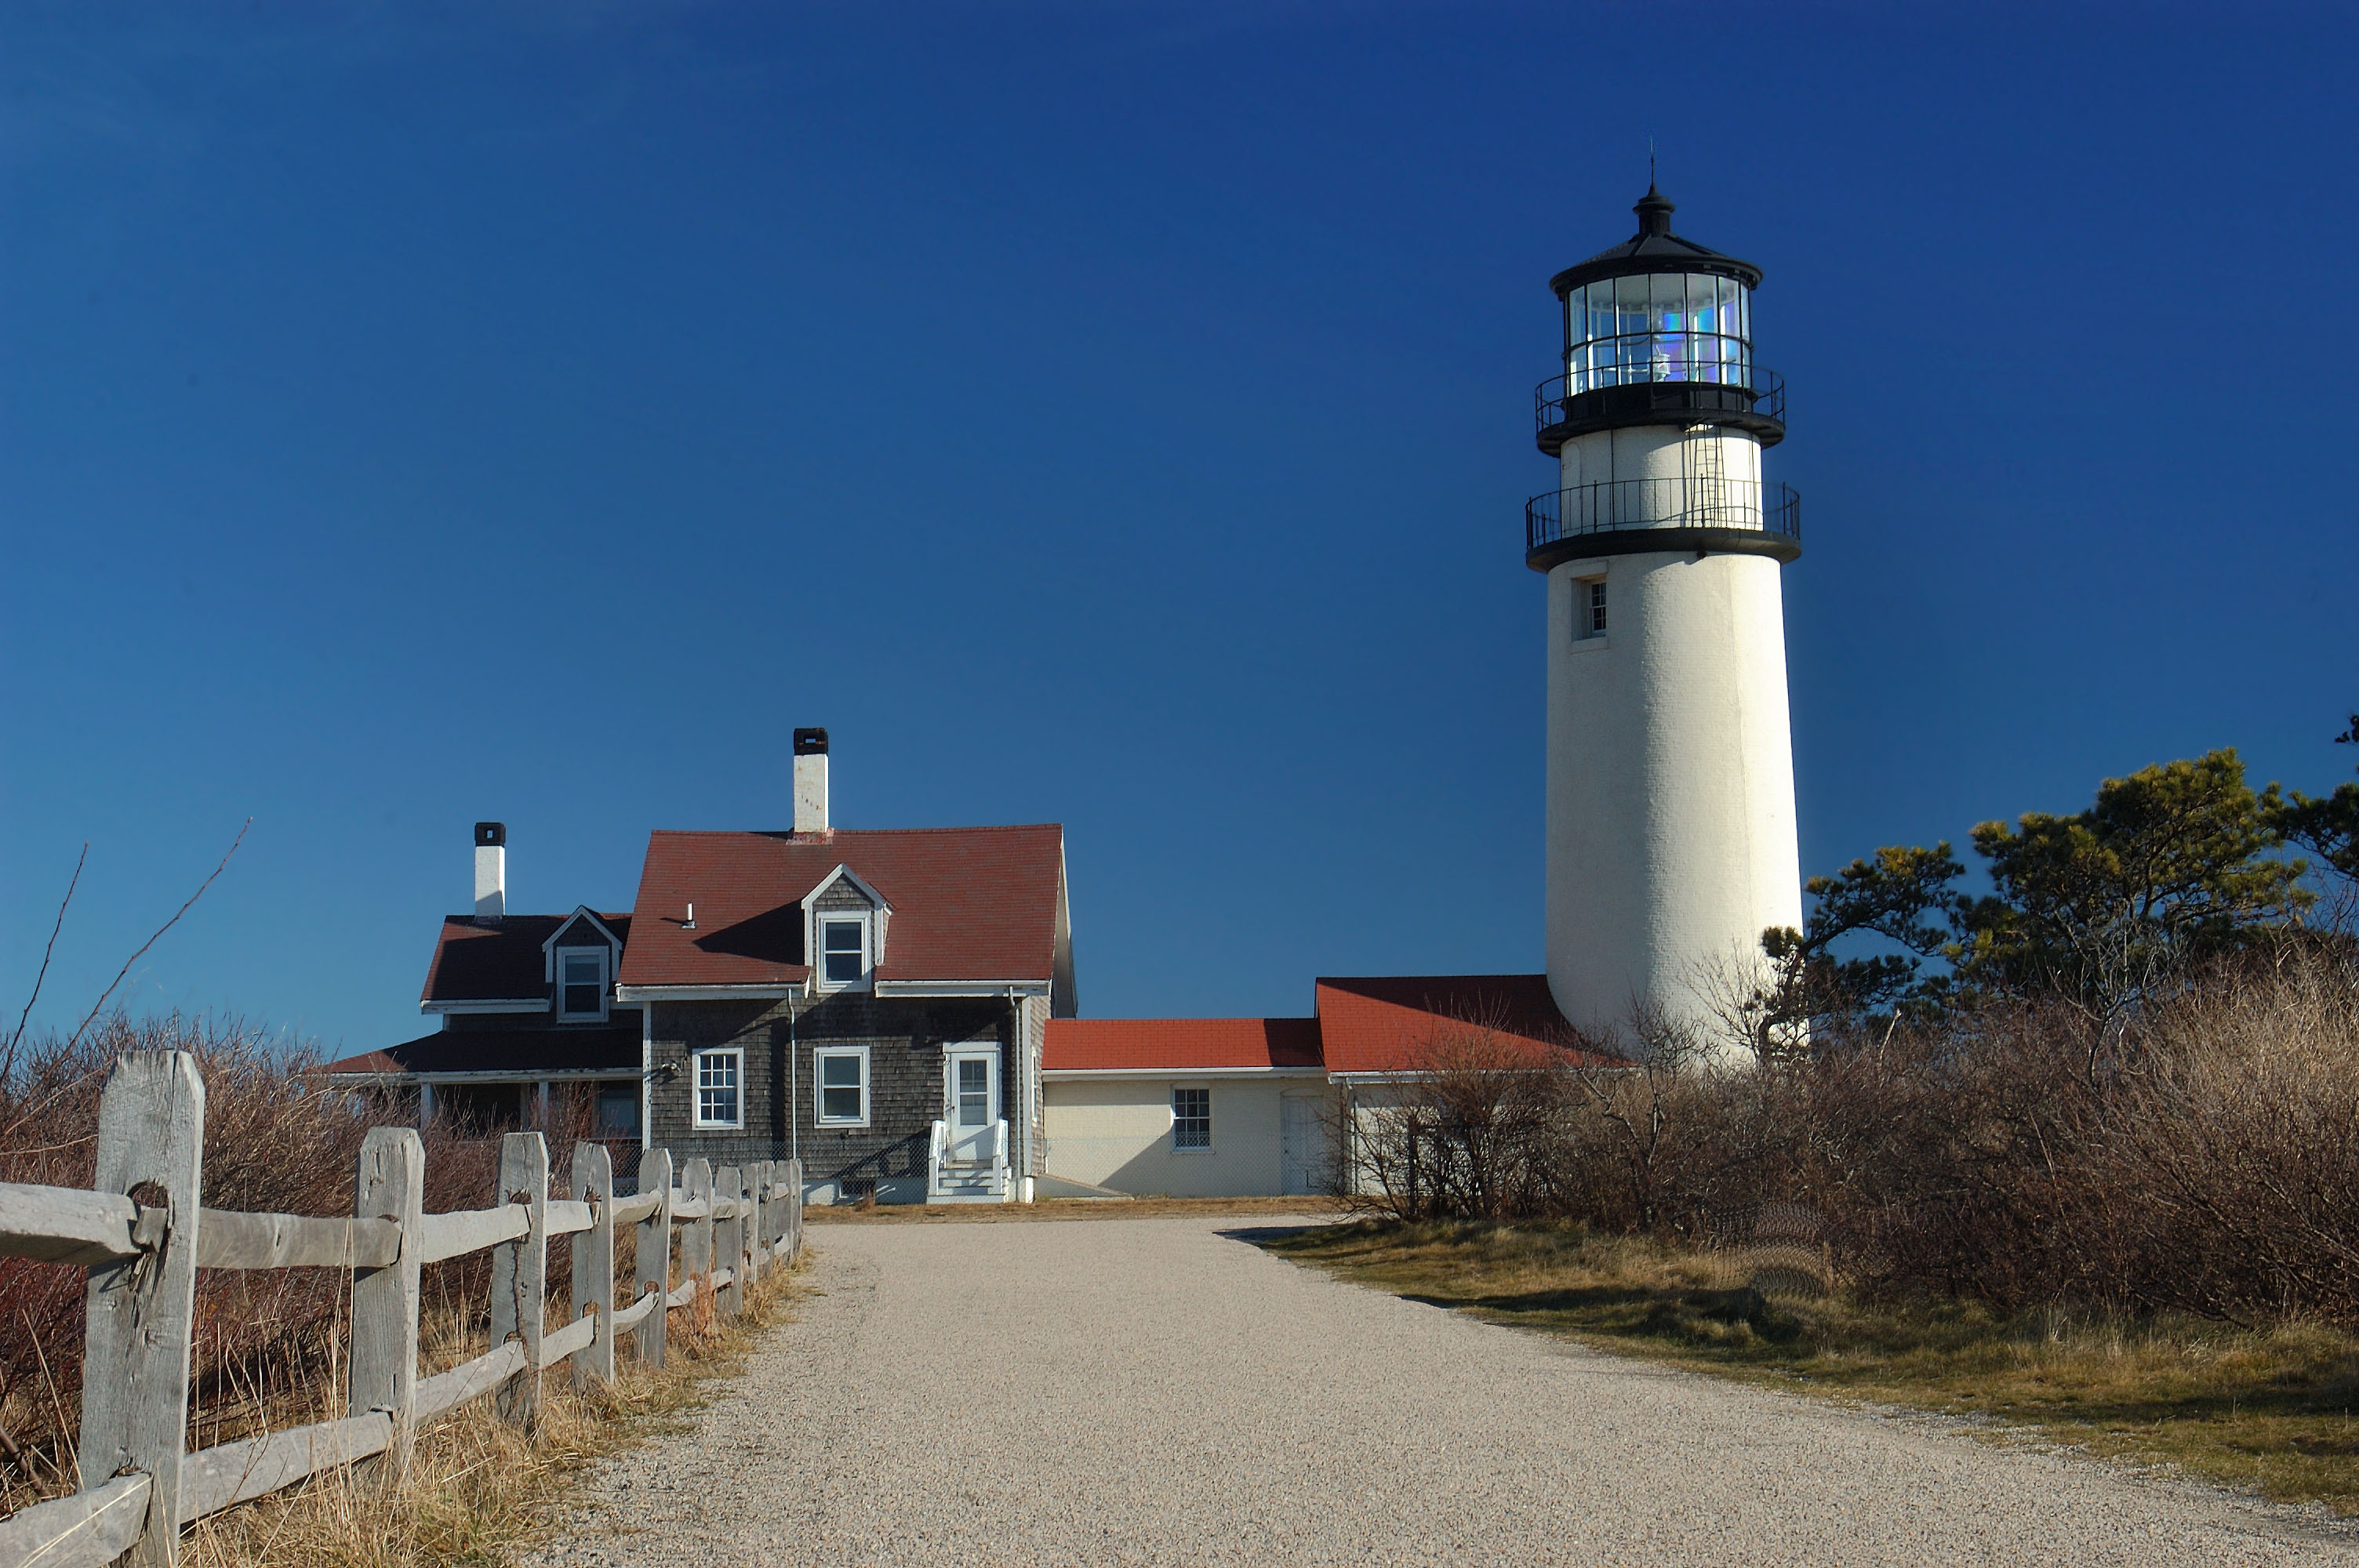 Cape cod, massachusetts live webcams